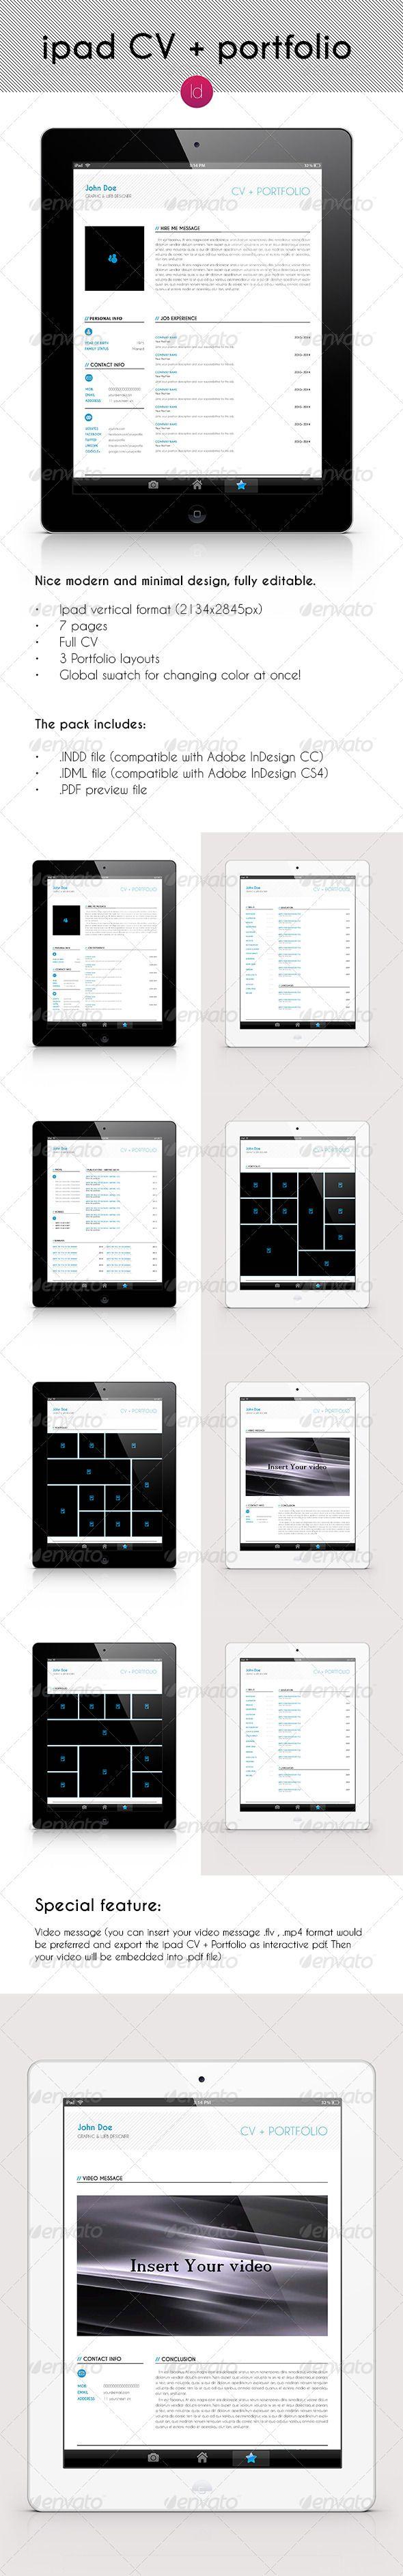 iPad CV + Portfolio